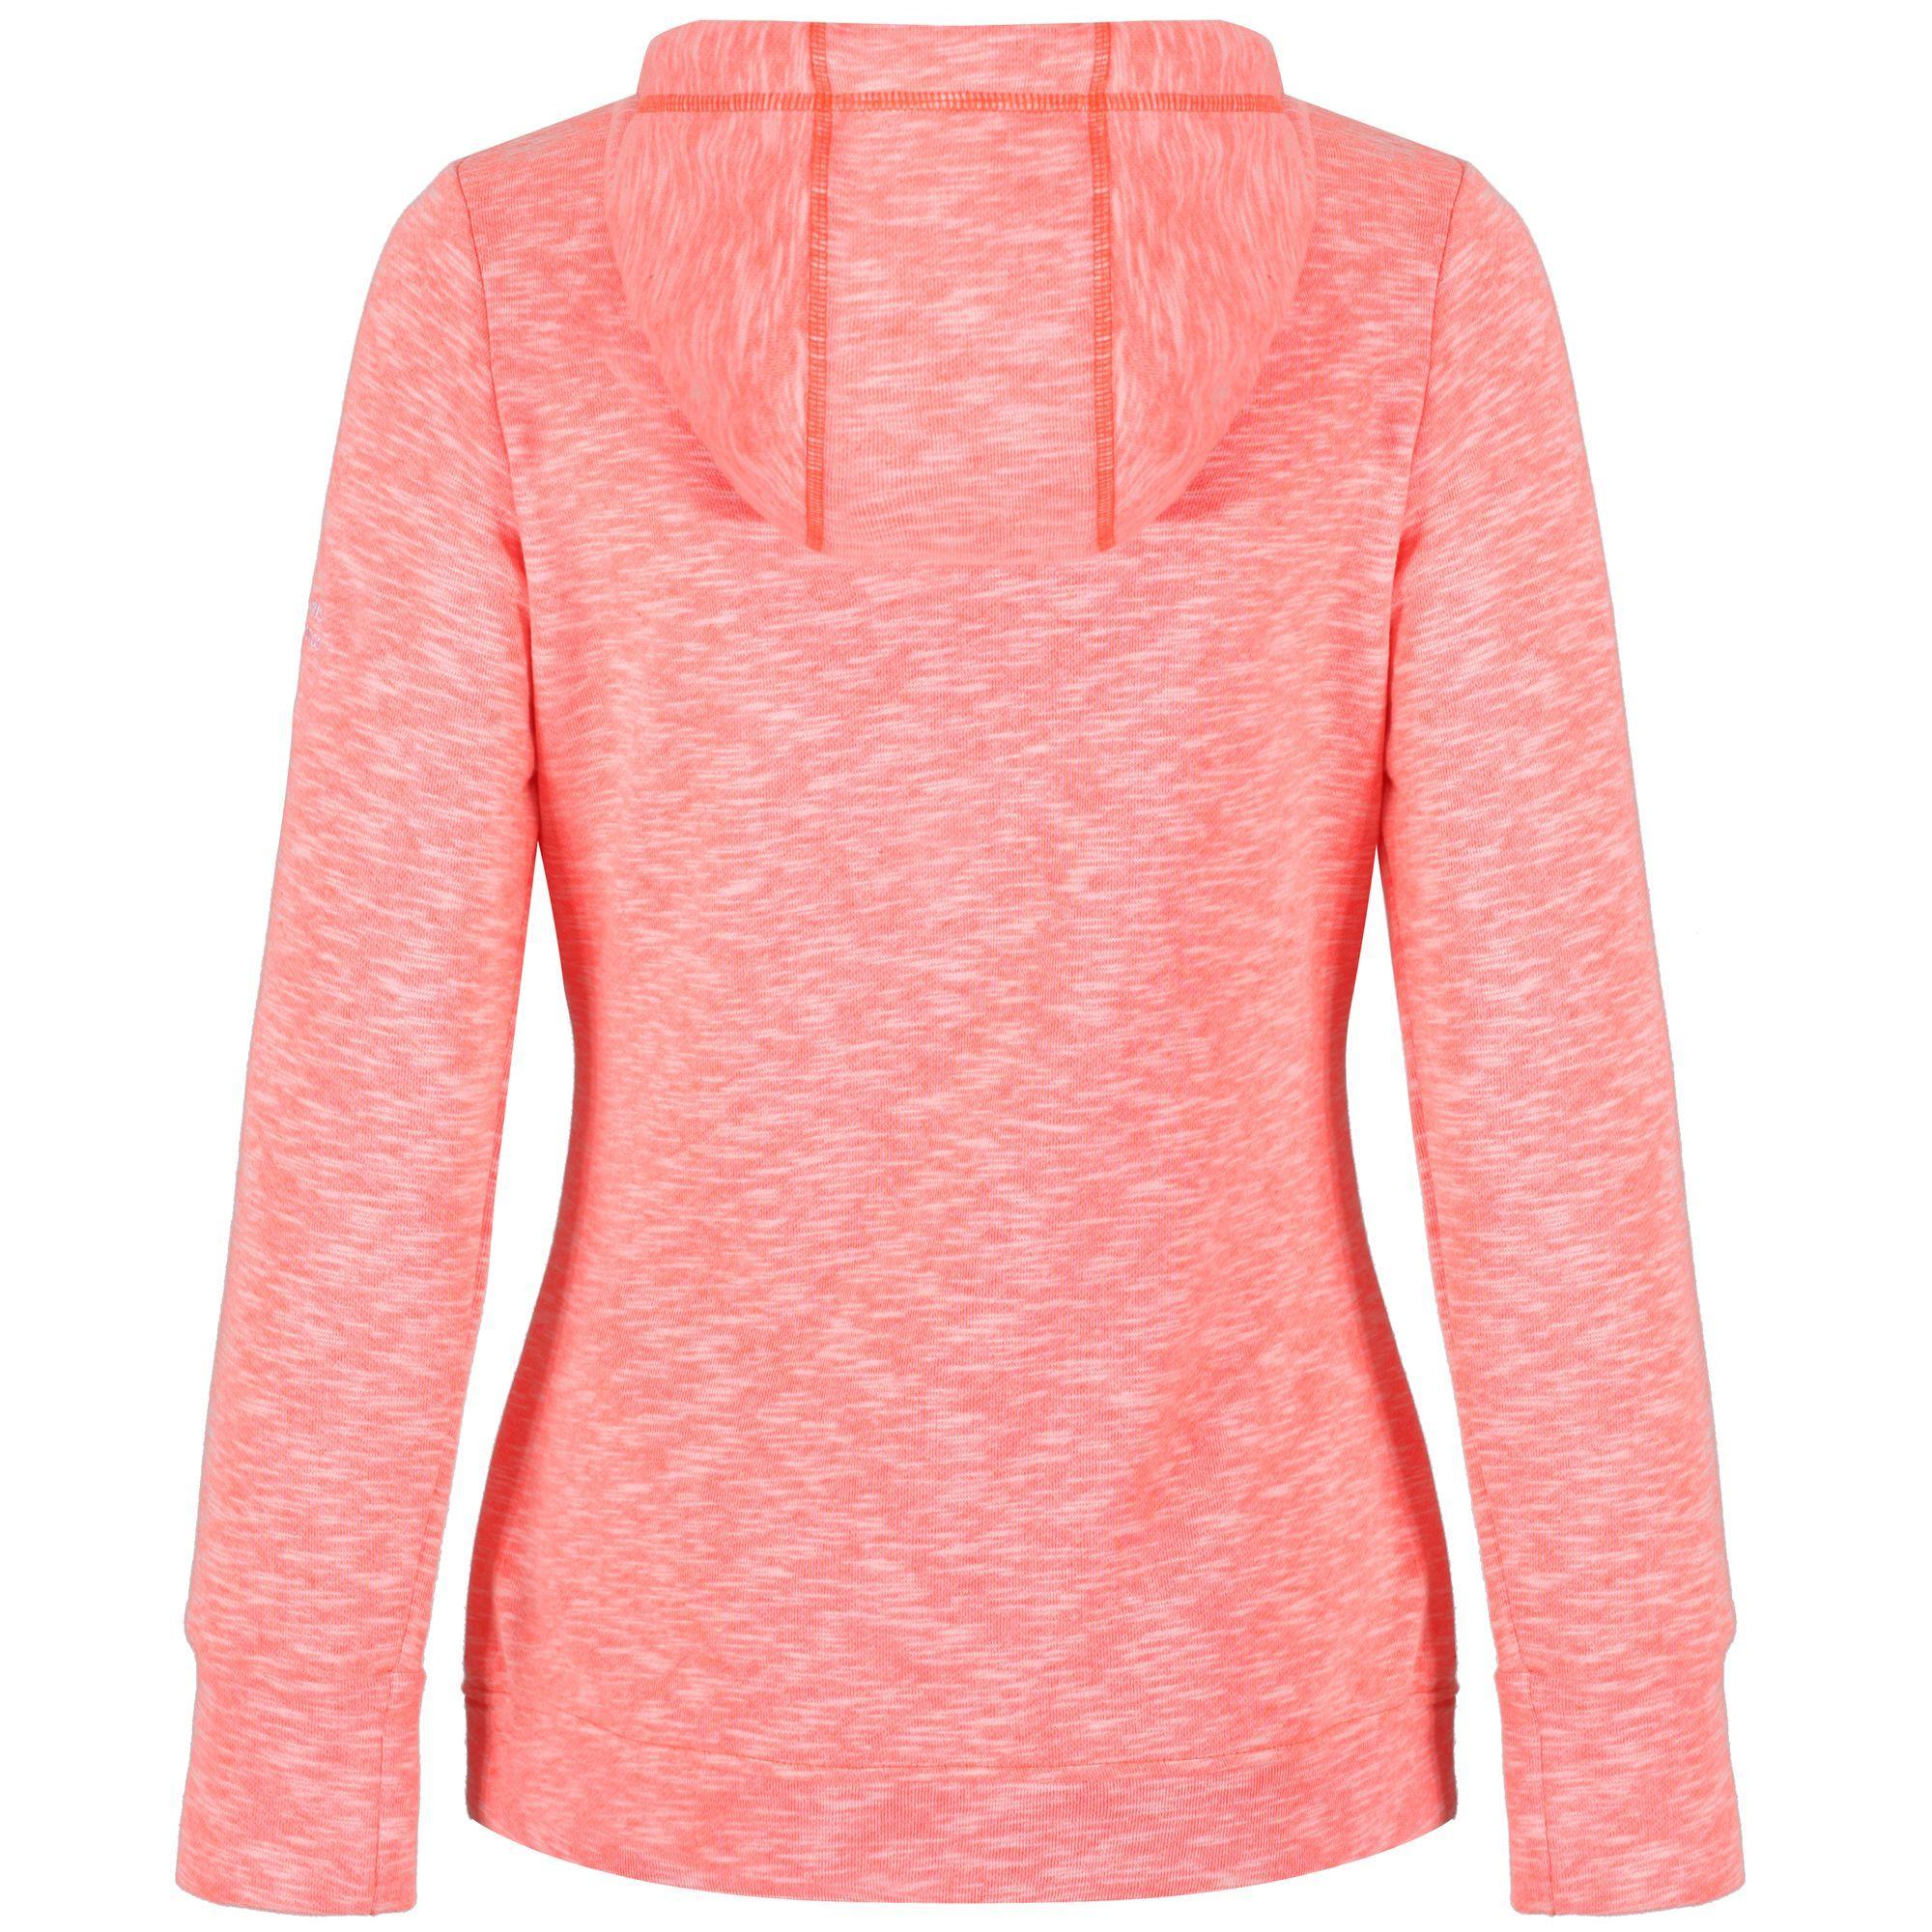 Regatta-Ramosa-Womens-Full-Zip-Hoodie-Hooded-Fleece-Jacket-RRP-50 thumbnail 9